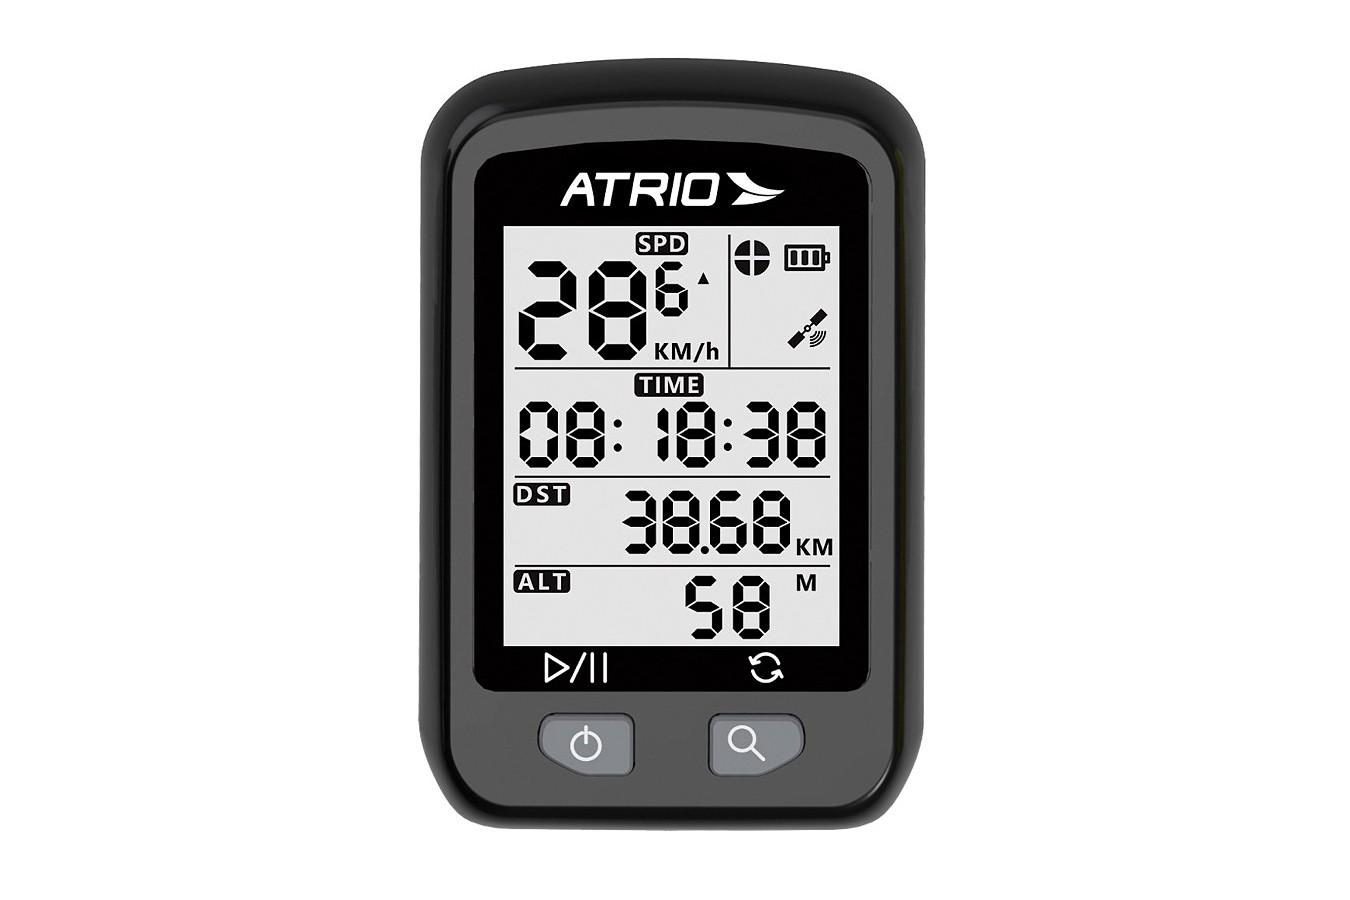 Velocímetro Bike Digital Iron Com GPS BI091 - Atrio